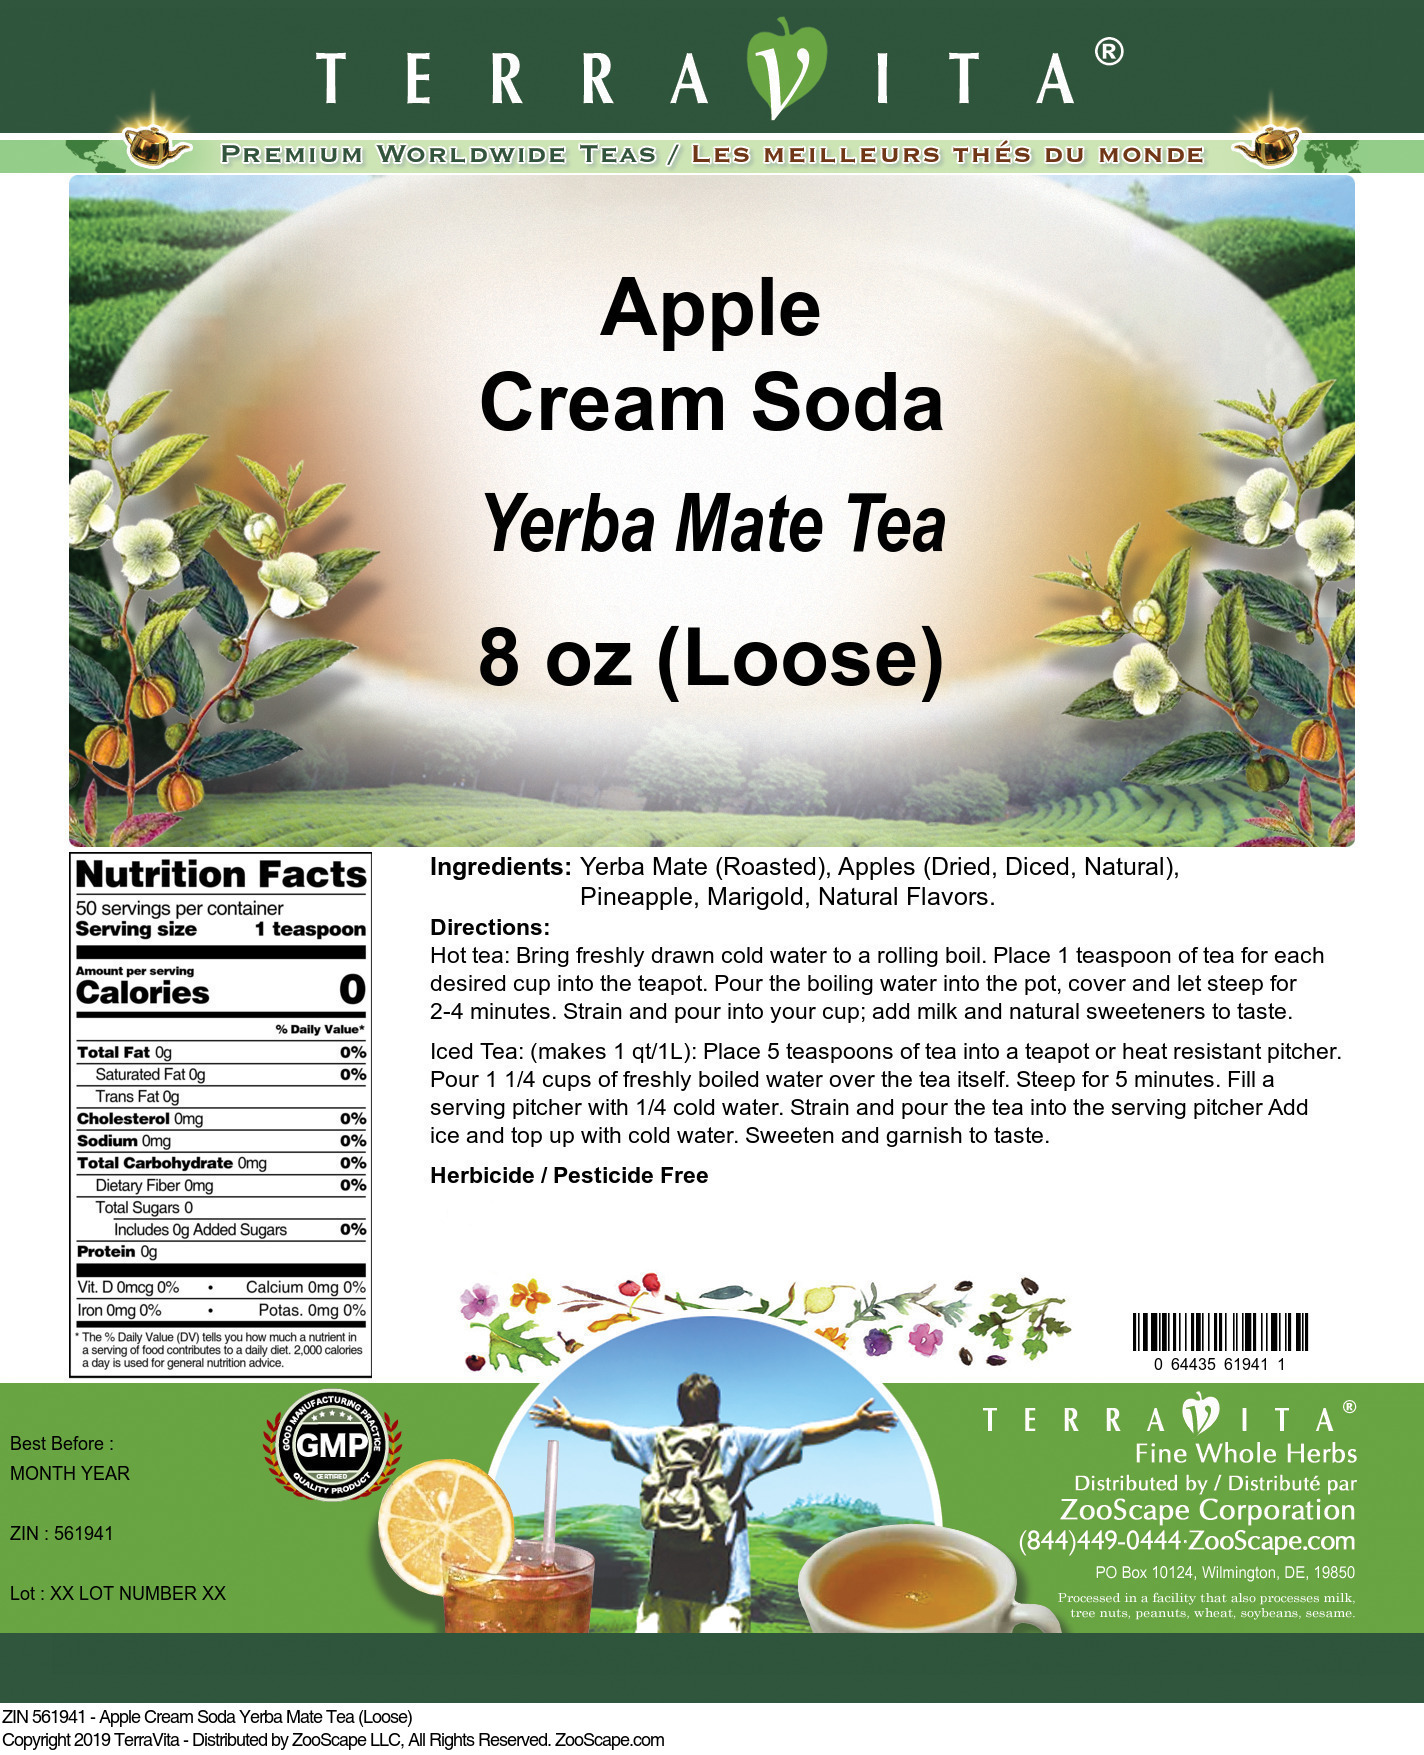 Apple Cream Soda Yerba Mate Tea (Loose)